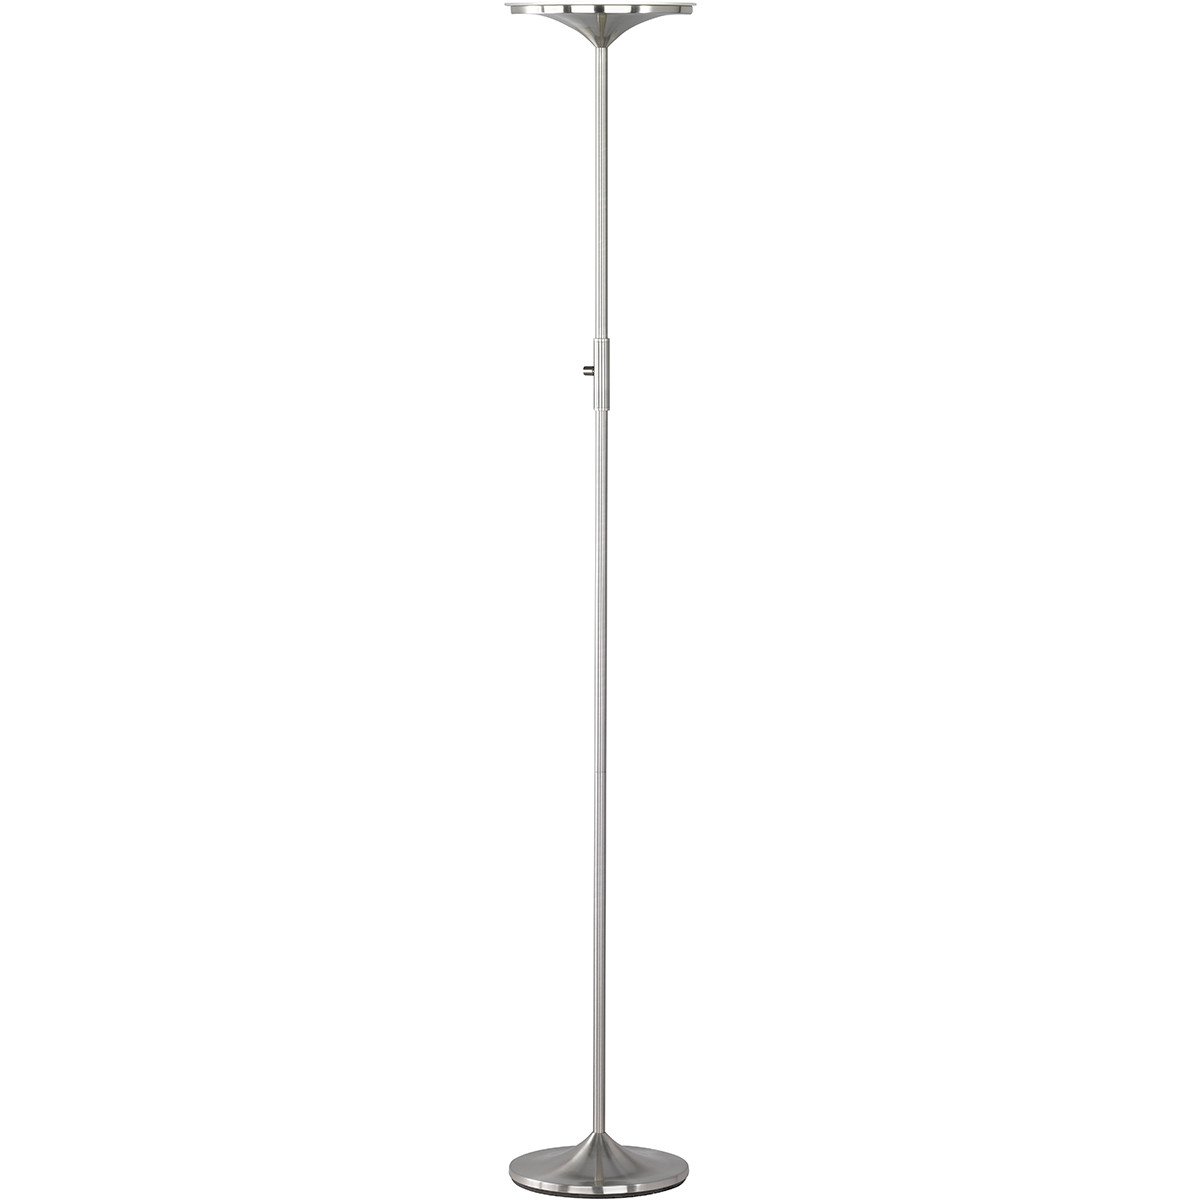 LED Vloerlamp - Trion Oringa - 20W - Warm Wit 3000K - Dimbaar - Rond - Mat Nikkel - Aluminium